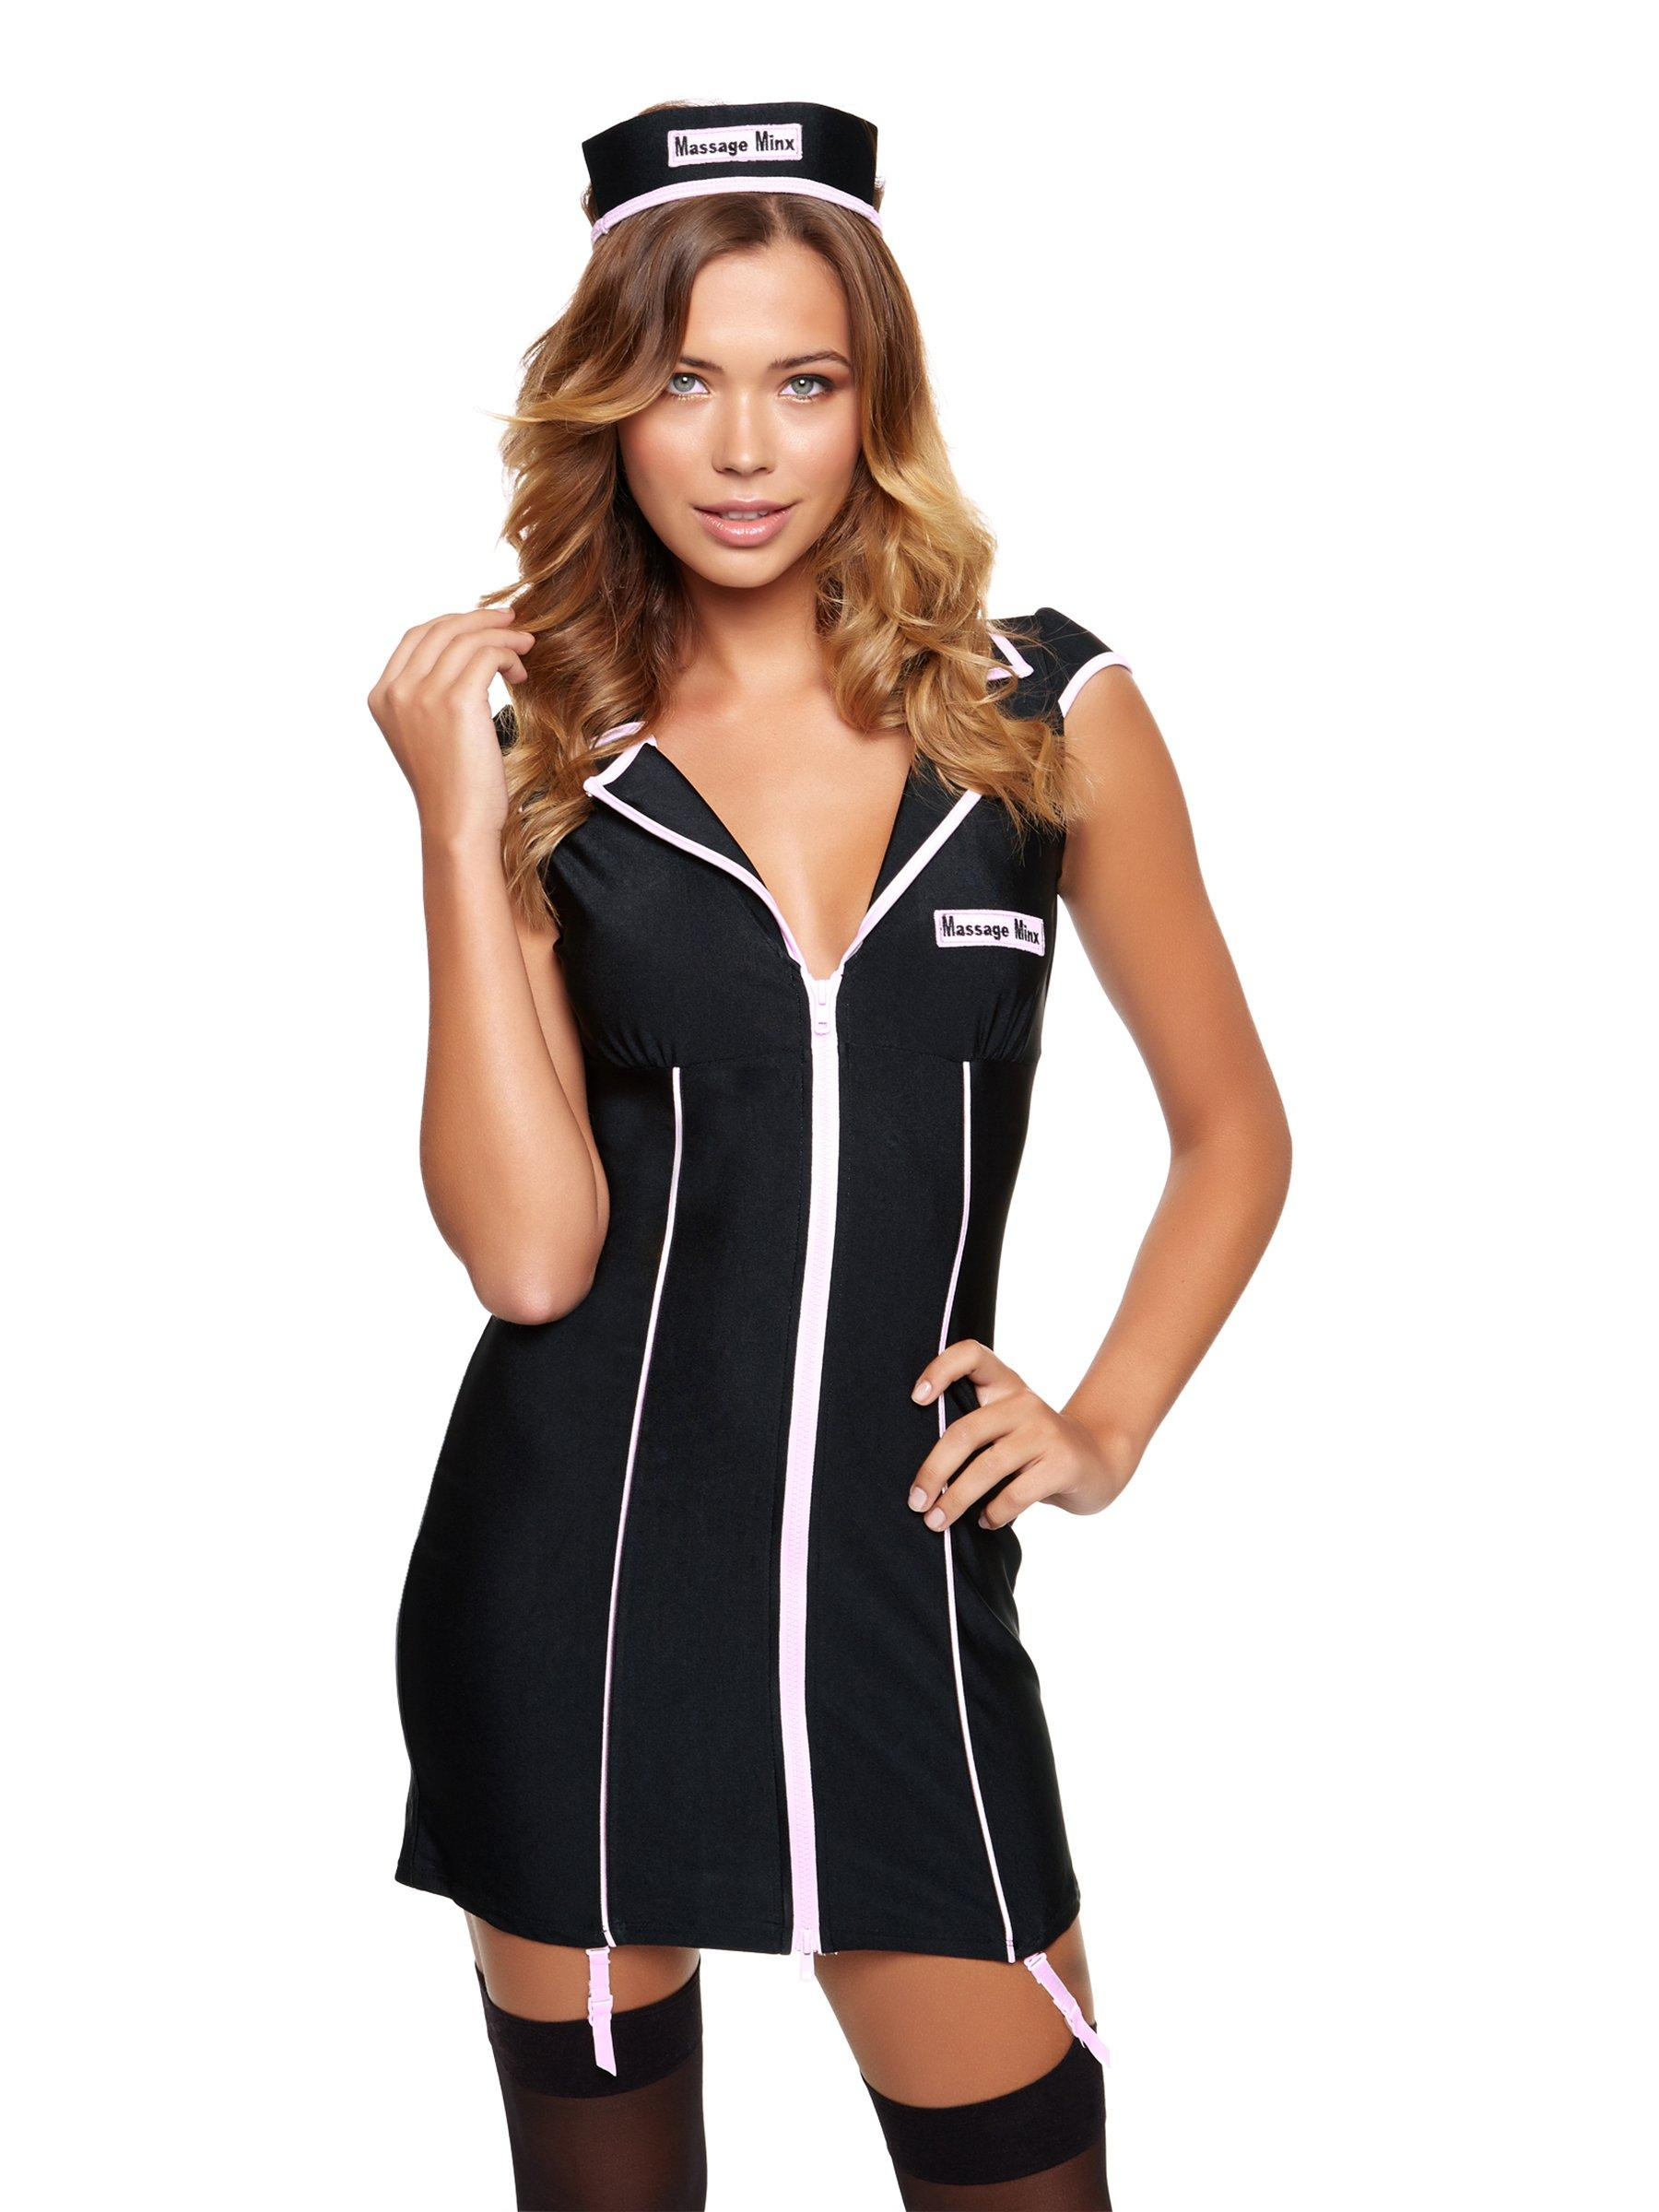 ann summers femme massage minx fancy dress outfit noir fermeture clair sexy costume ebay. Black Bedroom Furniture Sets. Home Design Ideas